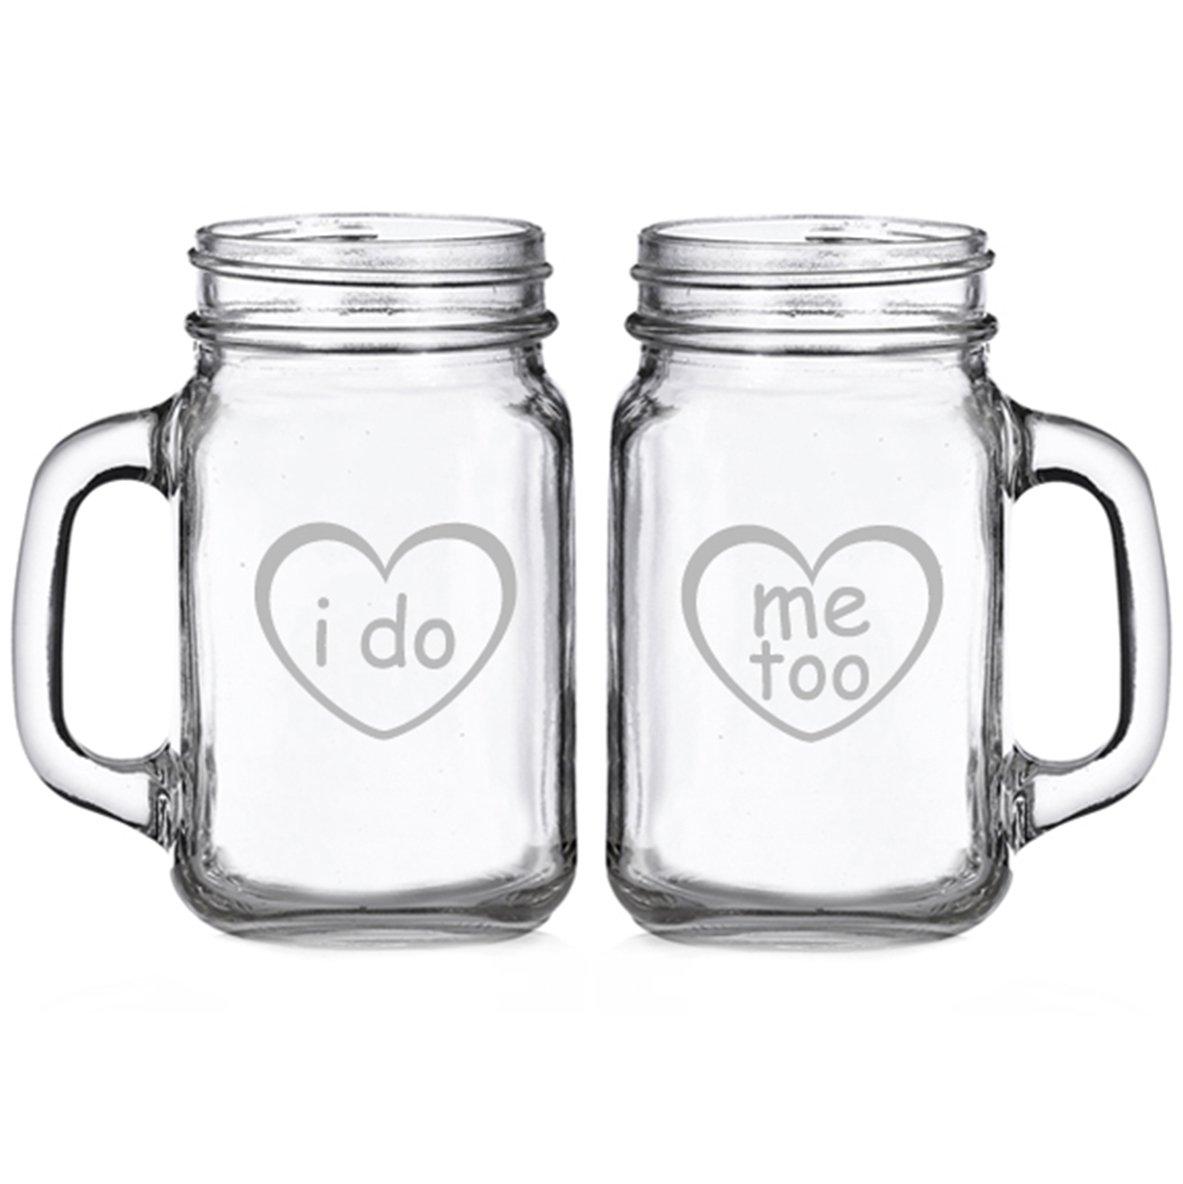 I Do and Me Too Conversation Heart Engraved Glass Mason Mugs (set of 2)